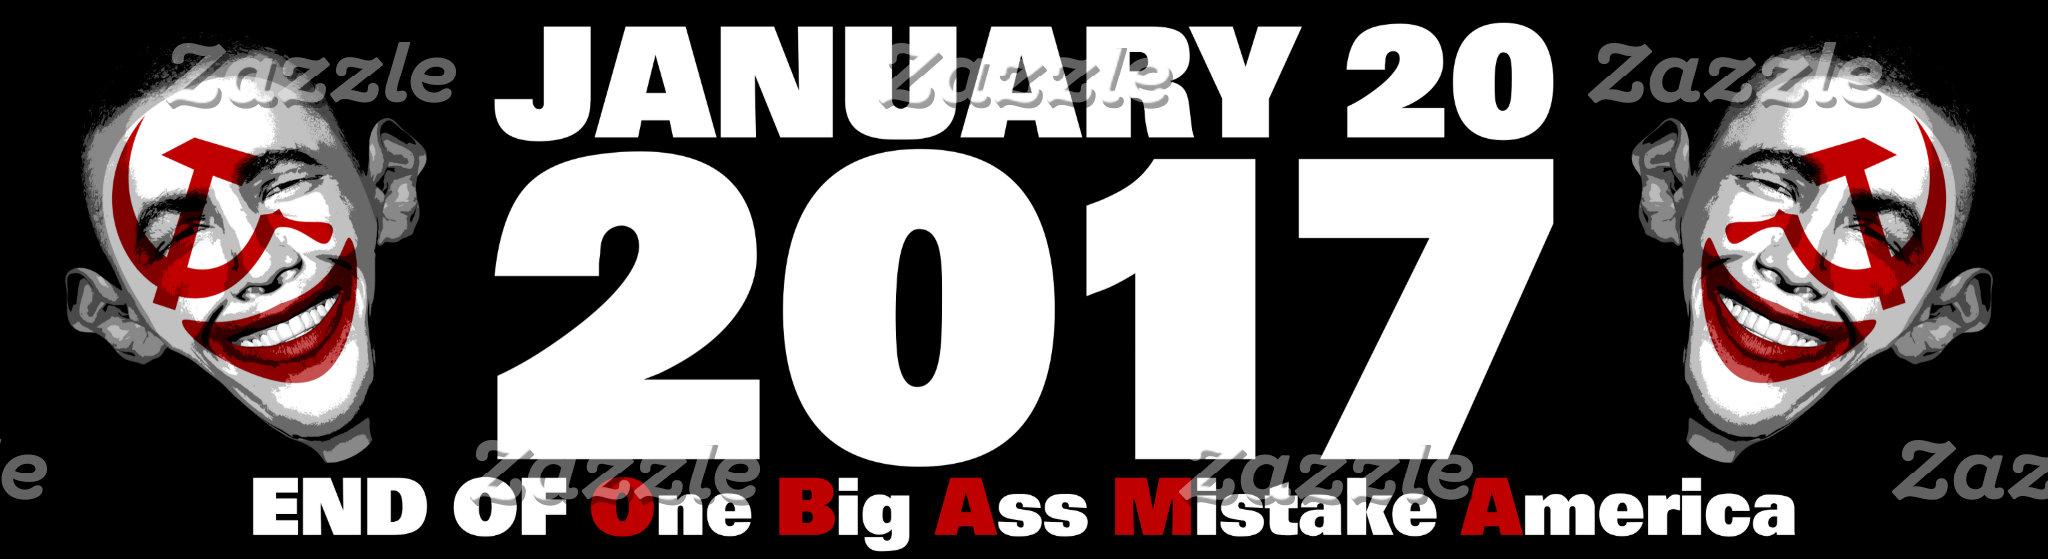 Anti obama   January 20, 2017